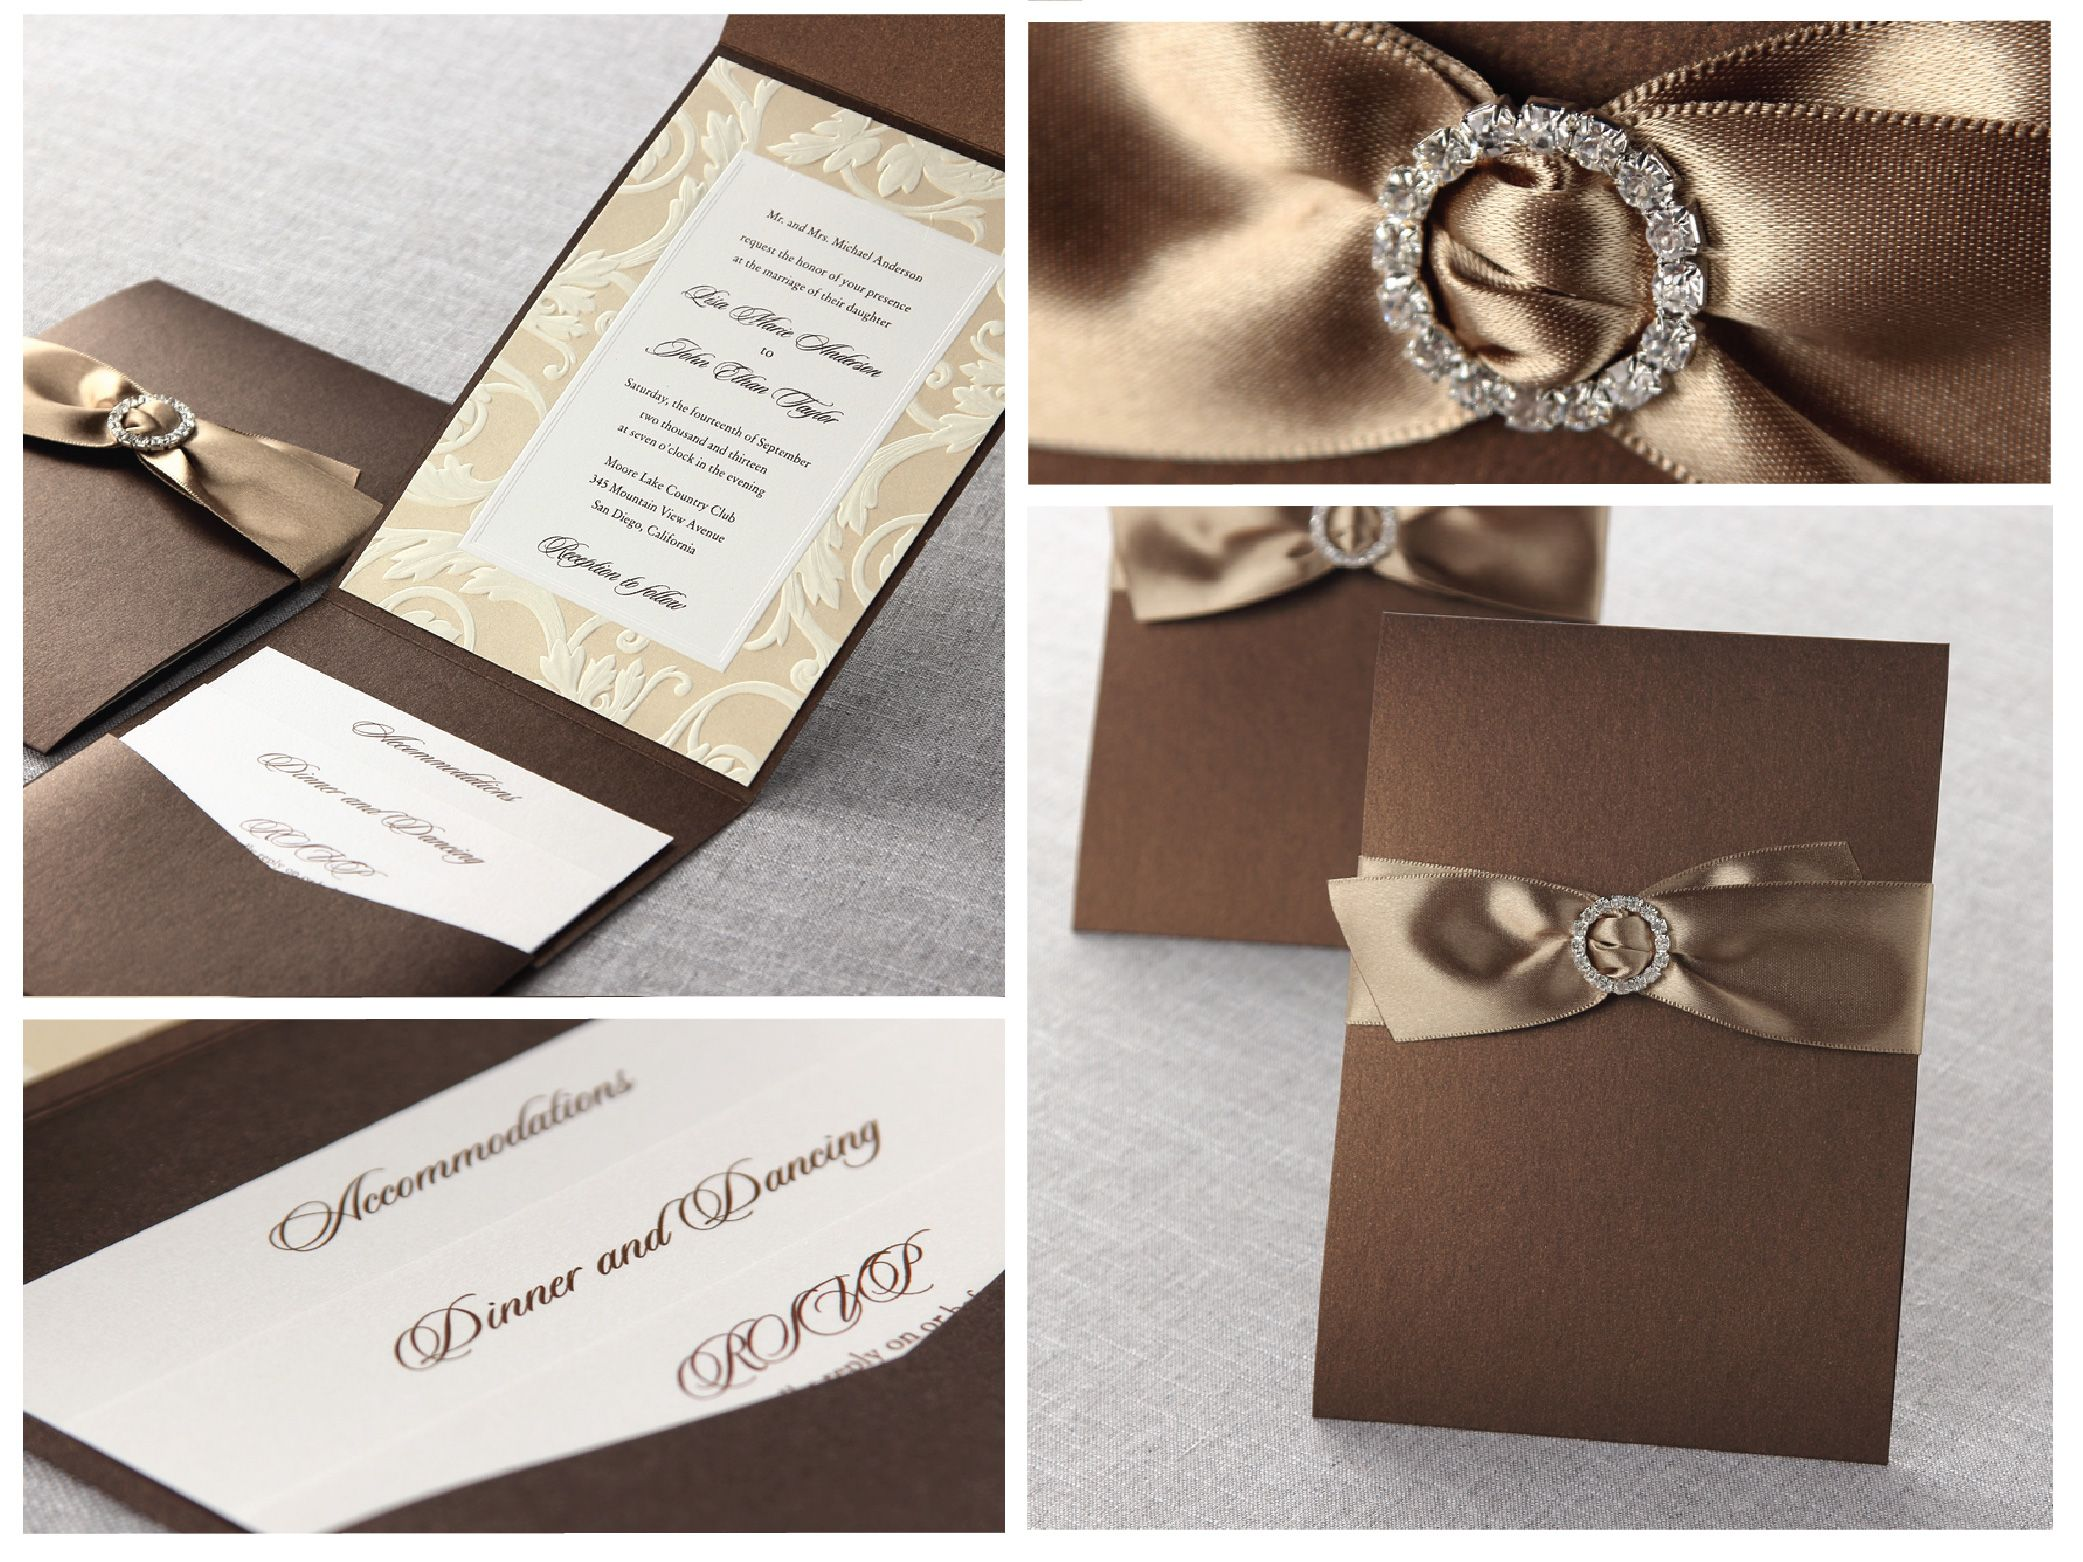 Embossed Swirl Frame by B Wedding Invitations  #weddinginvitations  #wedding  #invitations  #bweddinginvitations